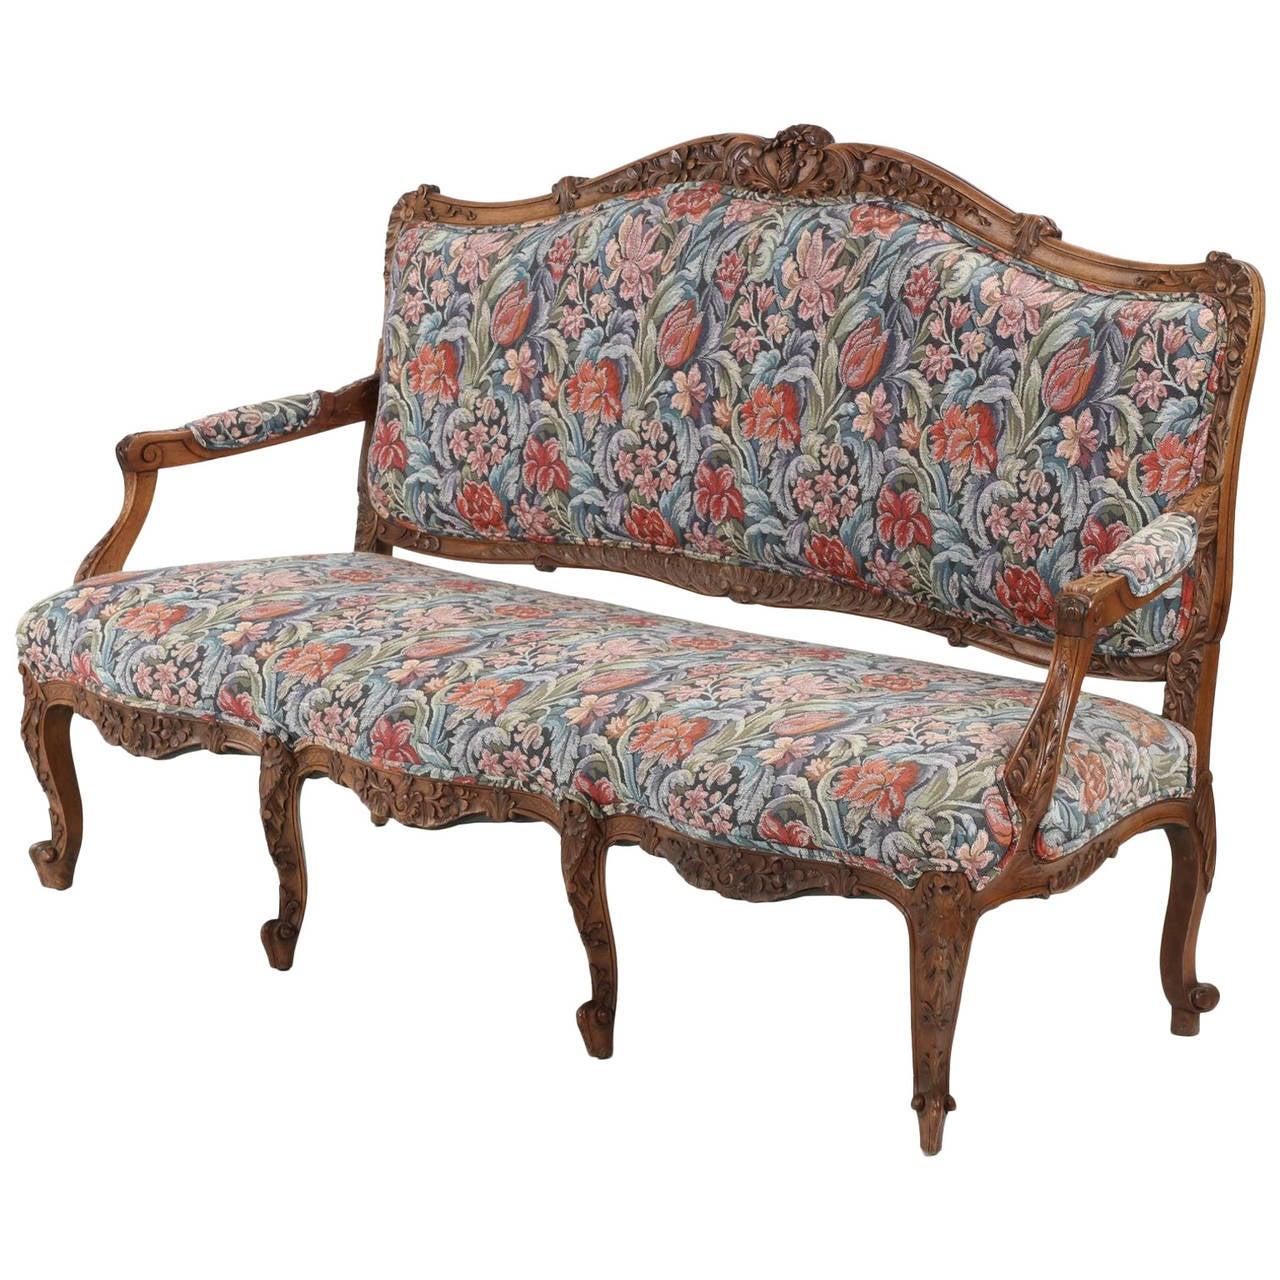 Rococo revival furniture - Rococo Revival Antique Carved Walnut Settee Sofa In Louis Xv Taste 19th Century 1